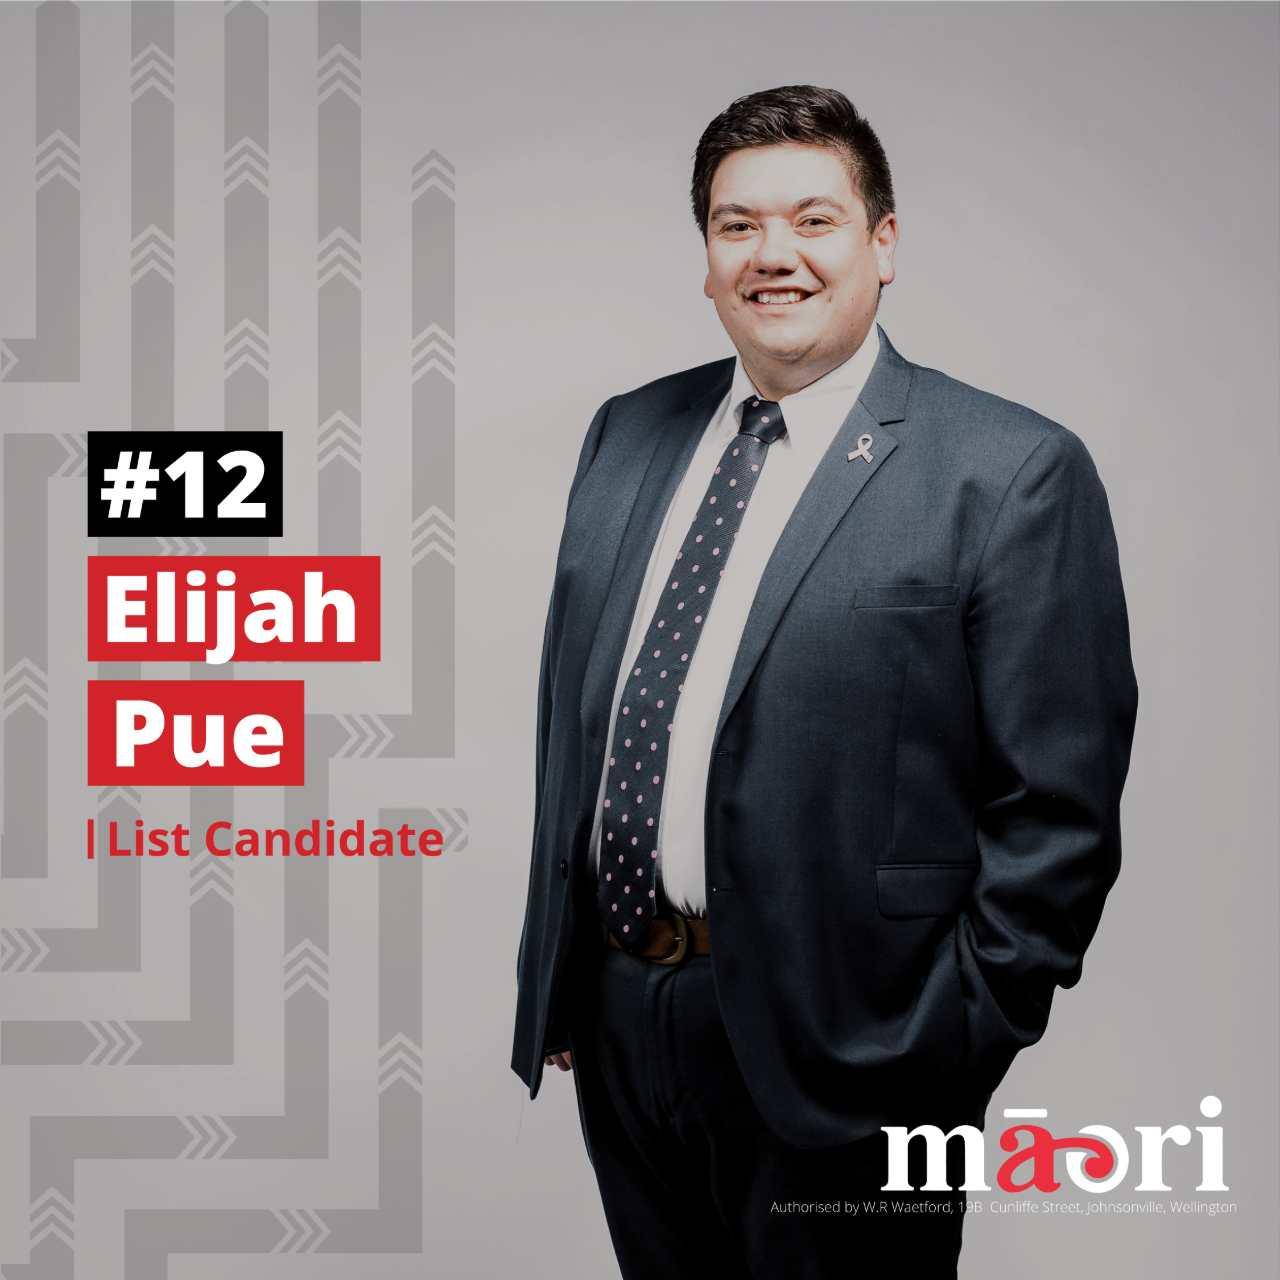 Elijah Pue, List Candidate